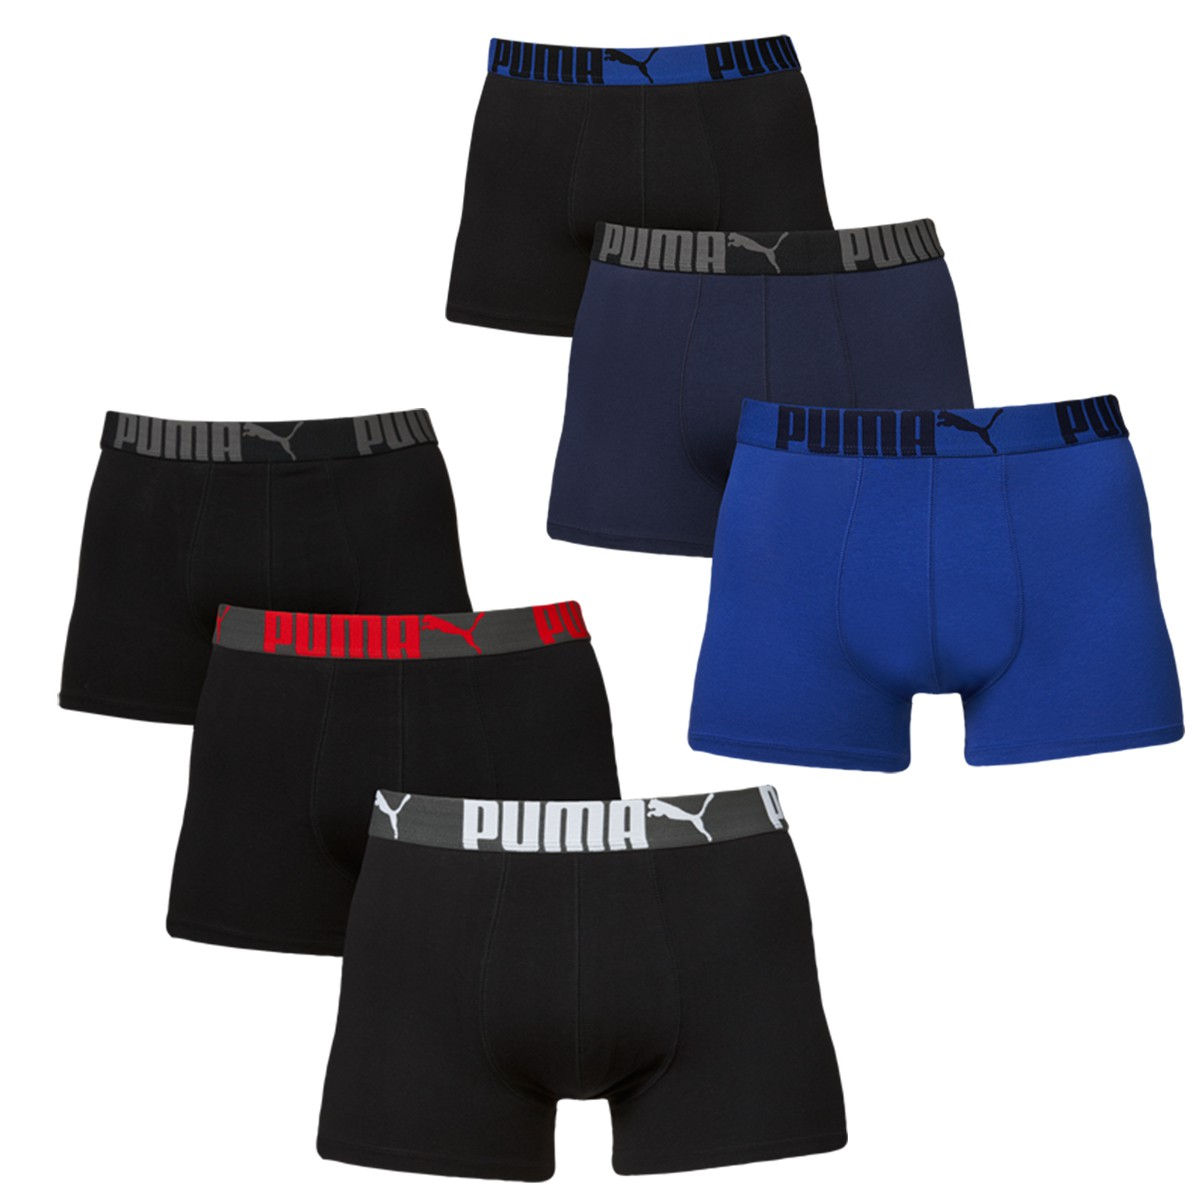 Puma--Boxer--Short-641380001-7681